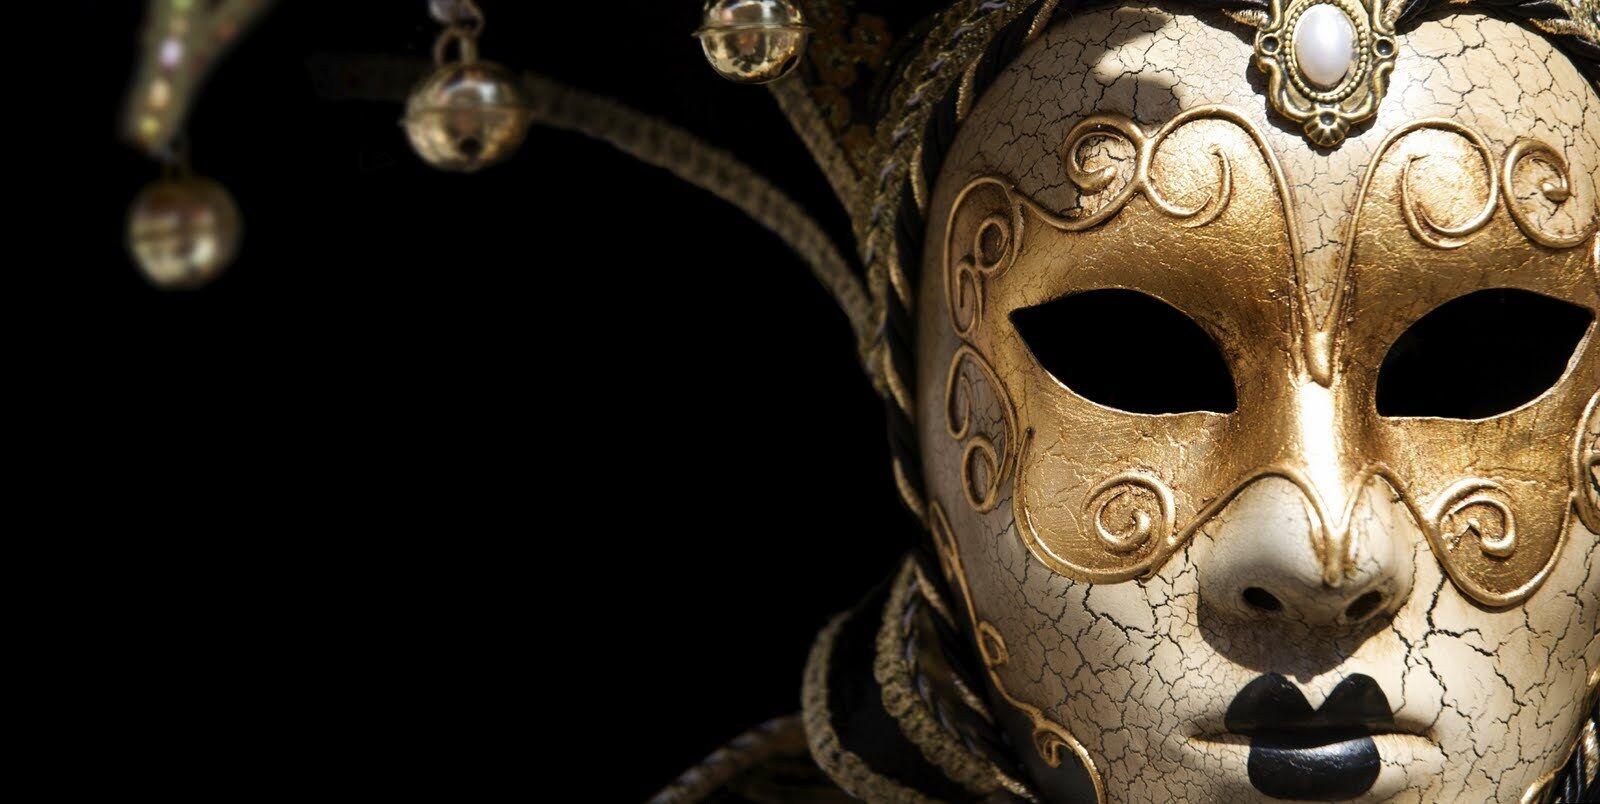 masquerade and party